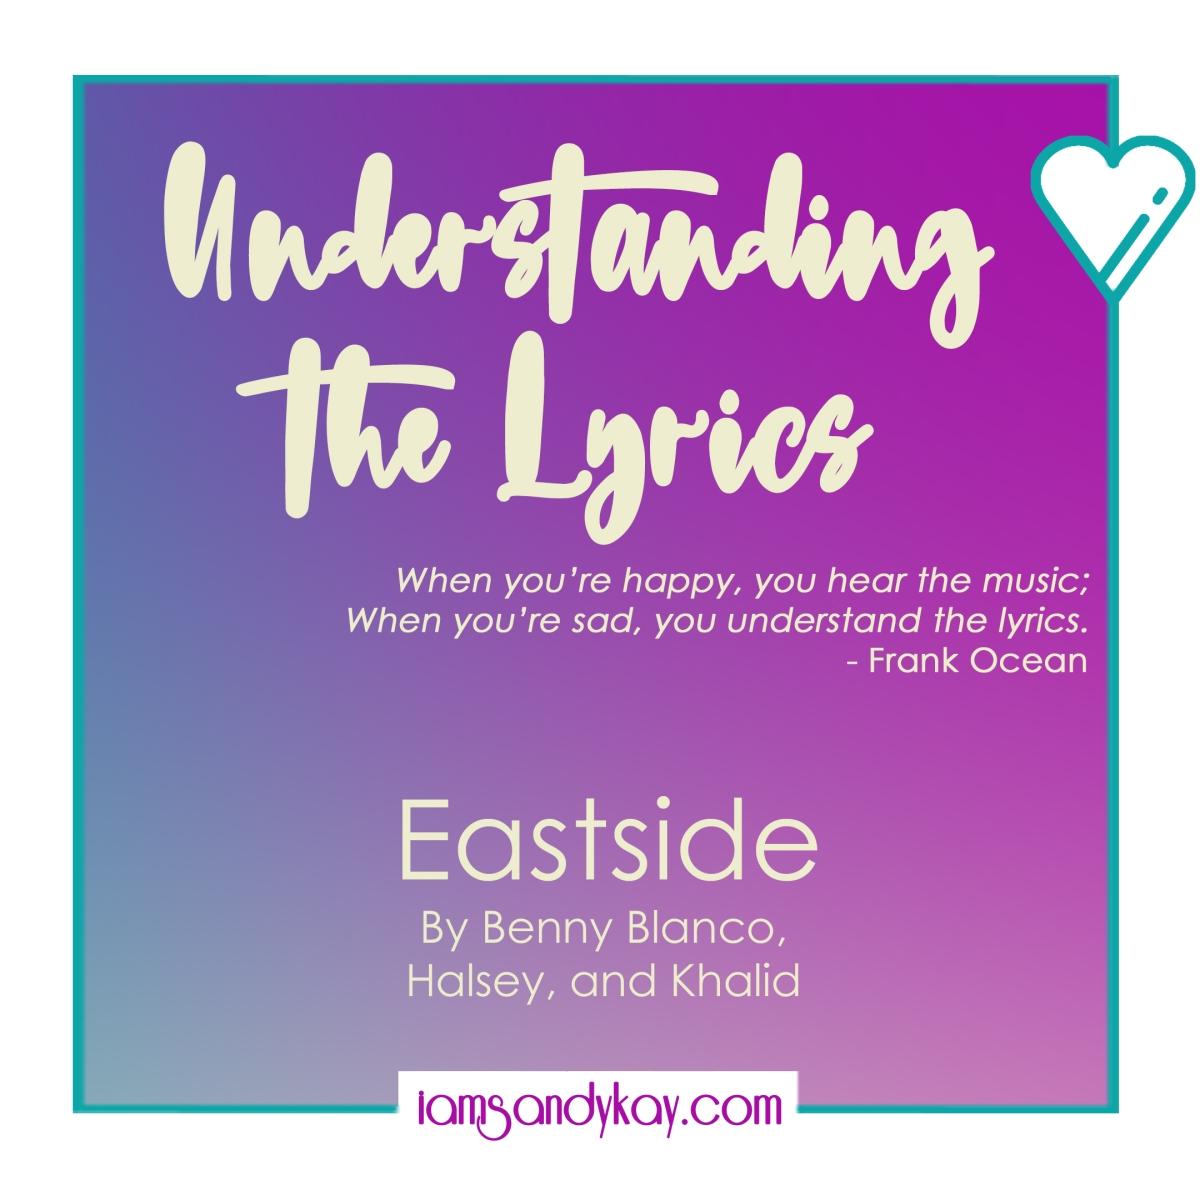 Understanding the Lyrics - Eastside by Benny Blanco, Halsey, and Kalid